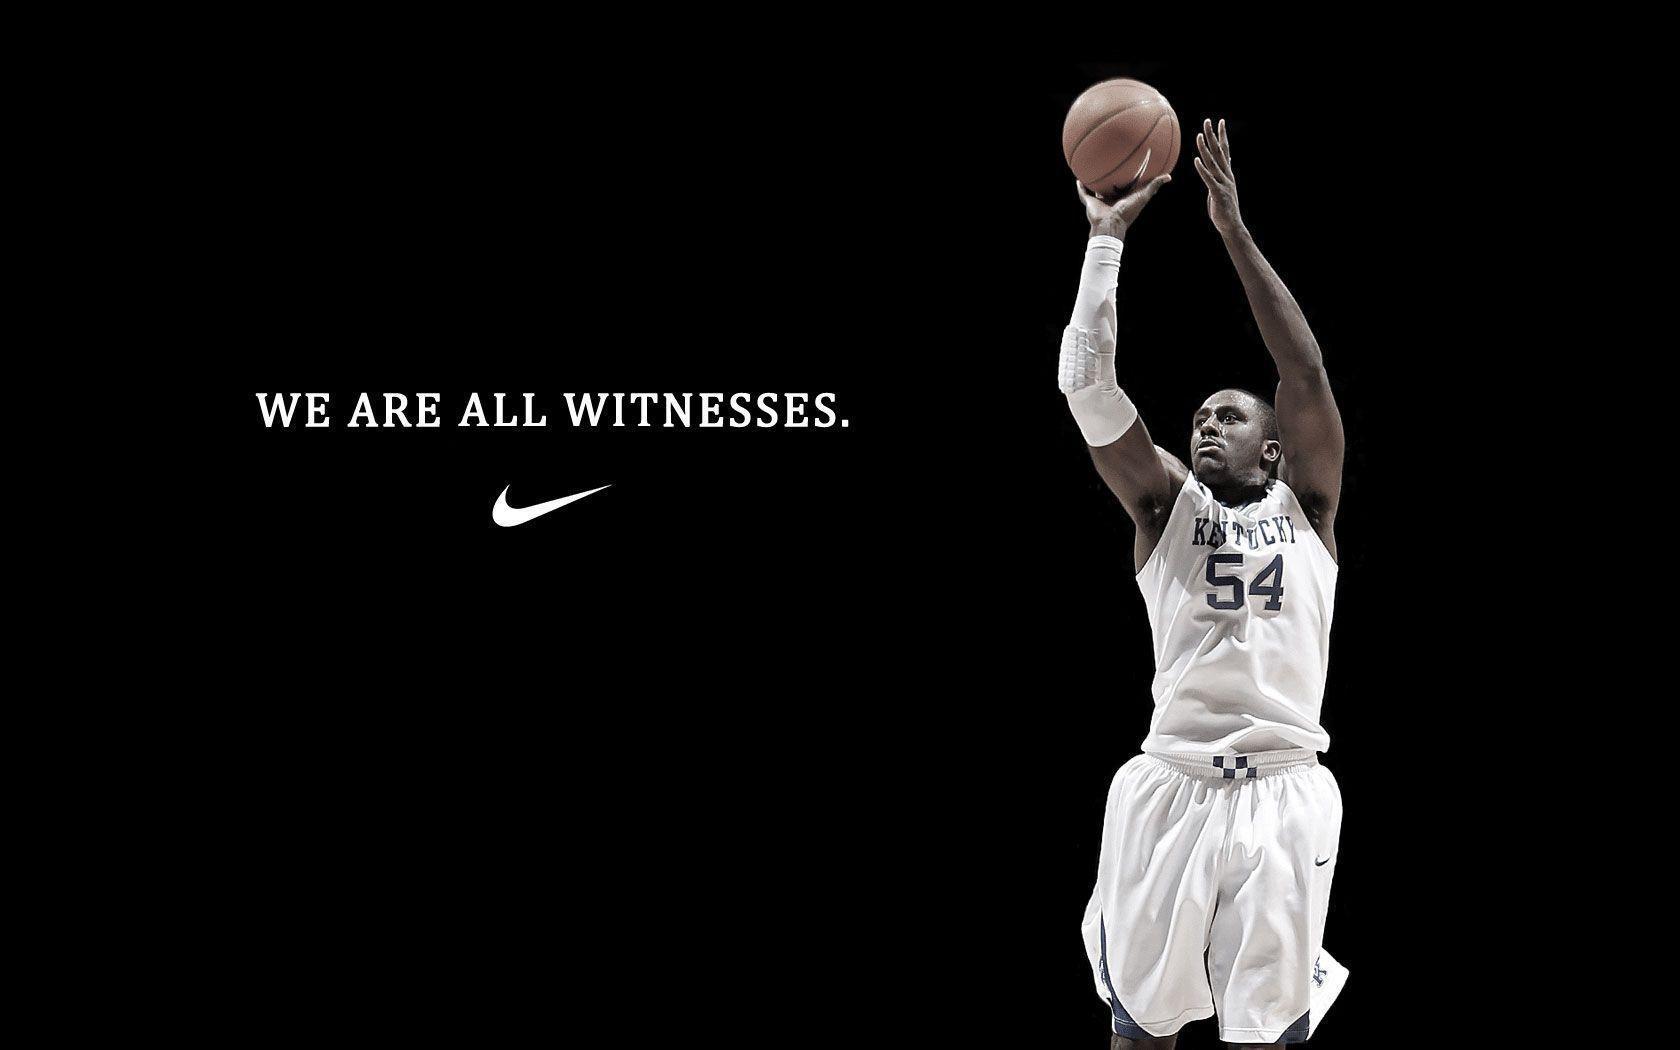 nike college basketball wallpaper - photo #1